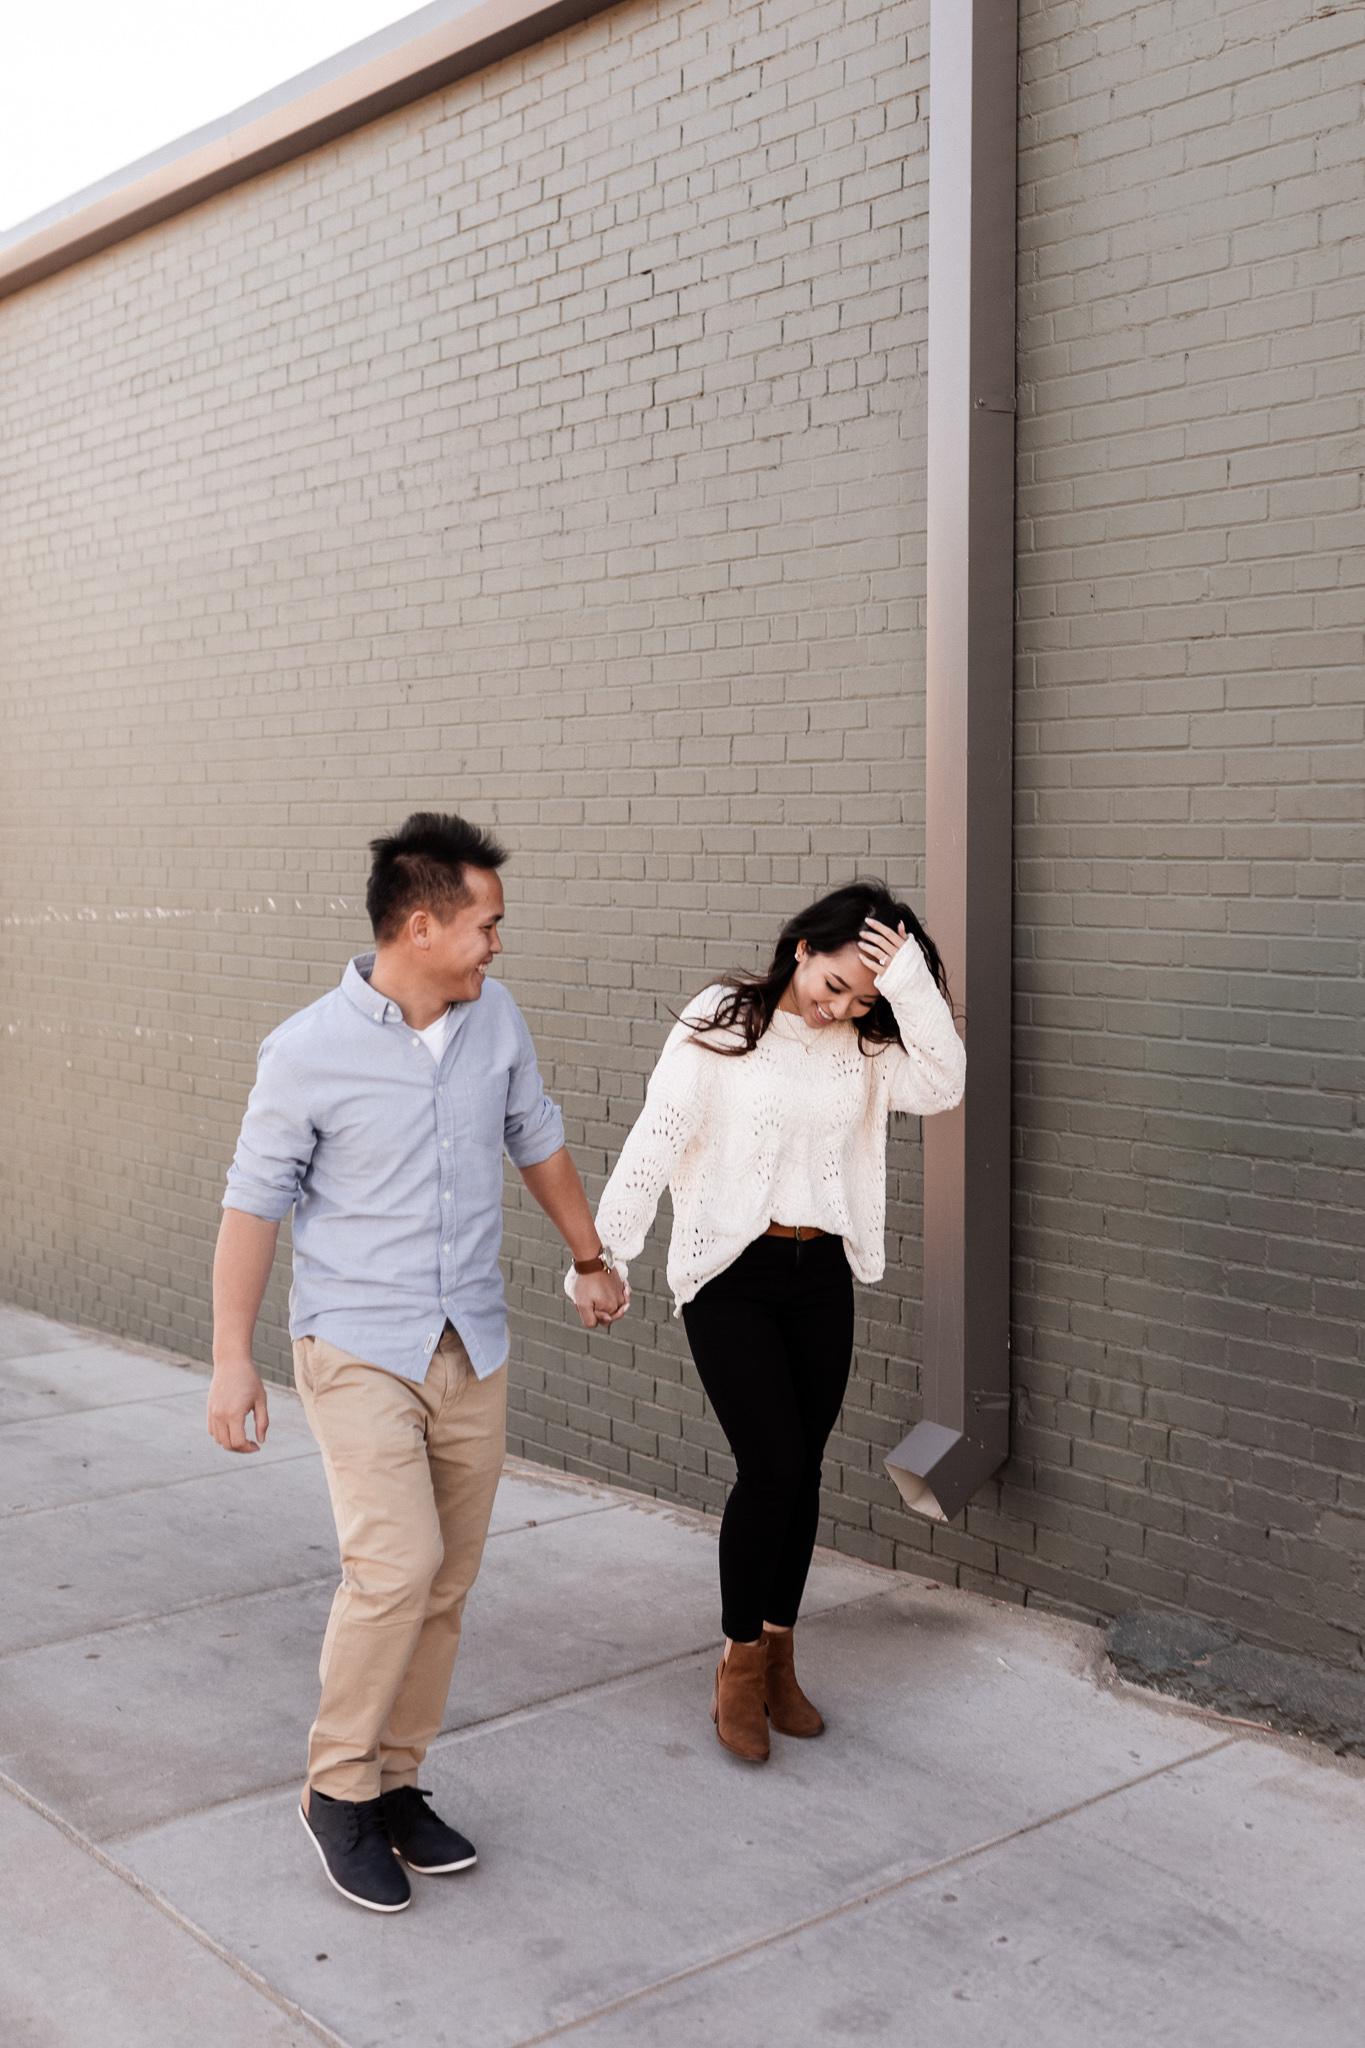 Hieu + Teresa | Colorful Romantic Downtown Engagements | Oklahoma Wedding Photographer-39.jpg